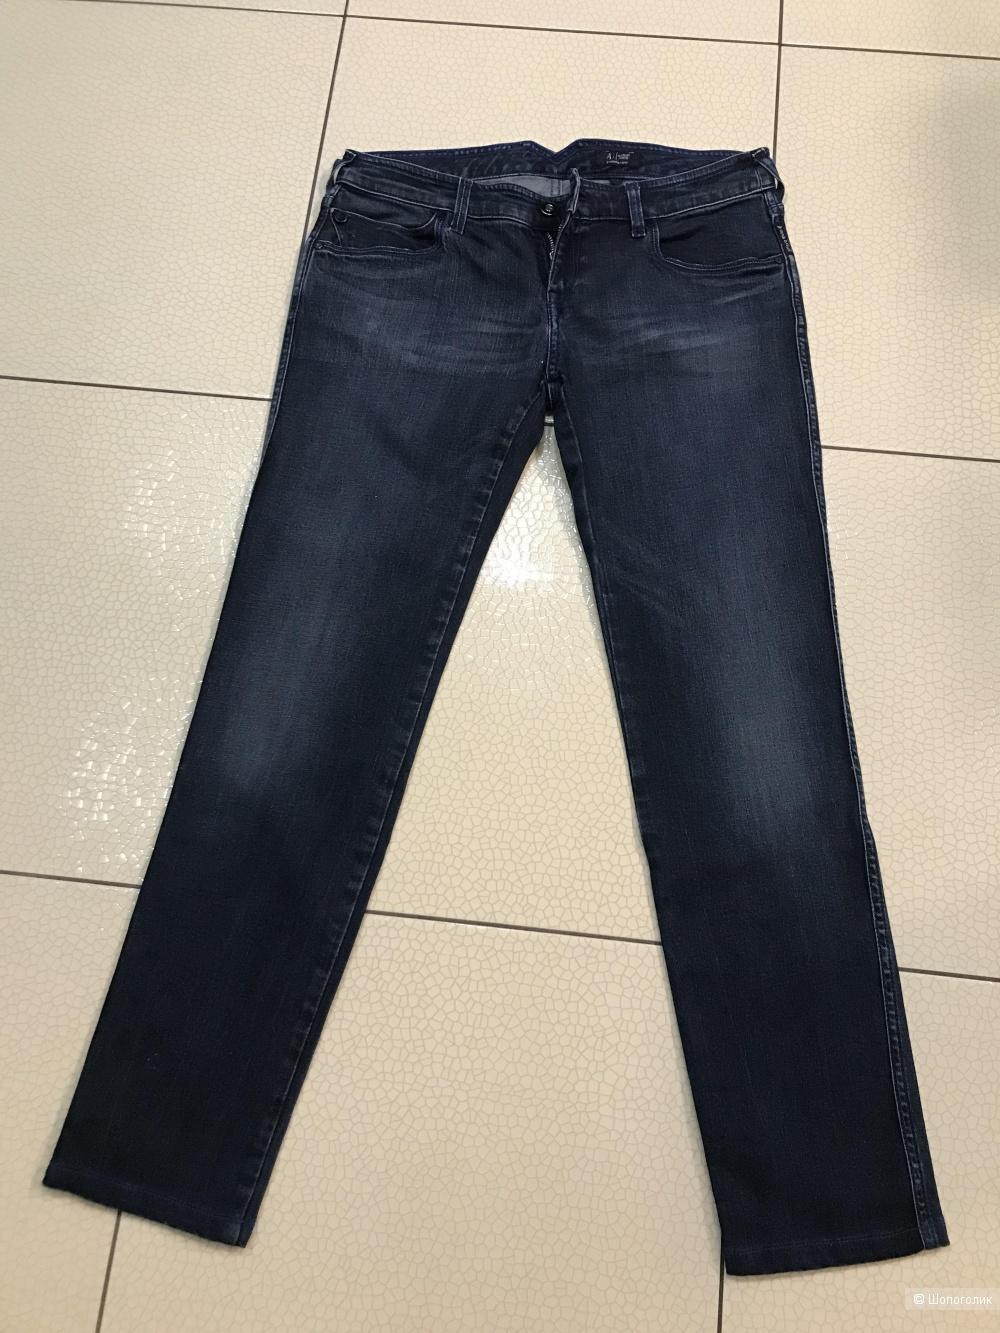 Джинсы Armani Jeans р 31 диз